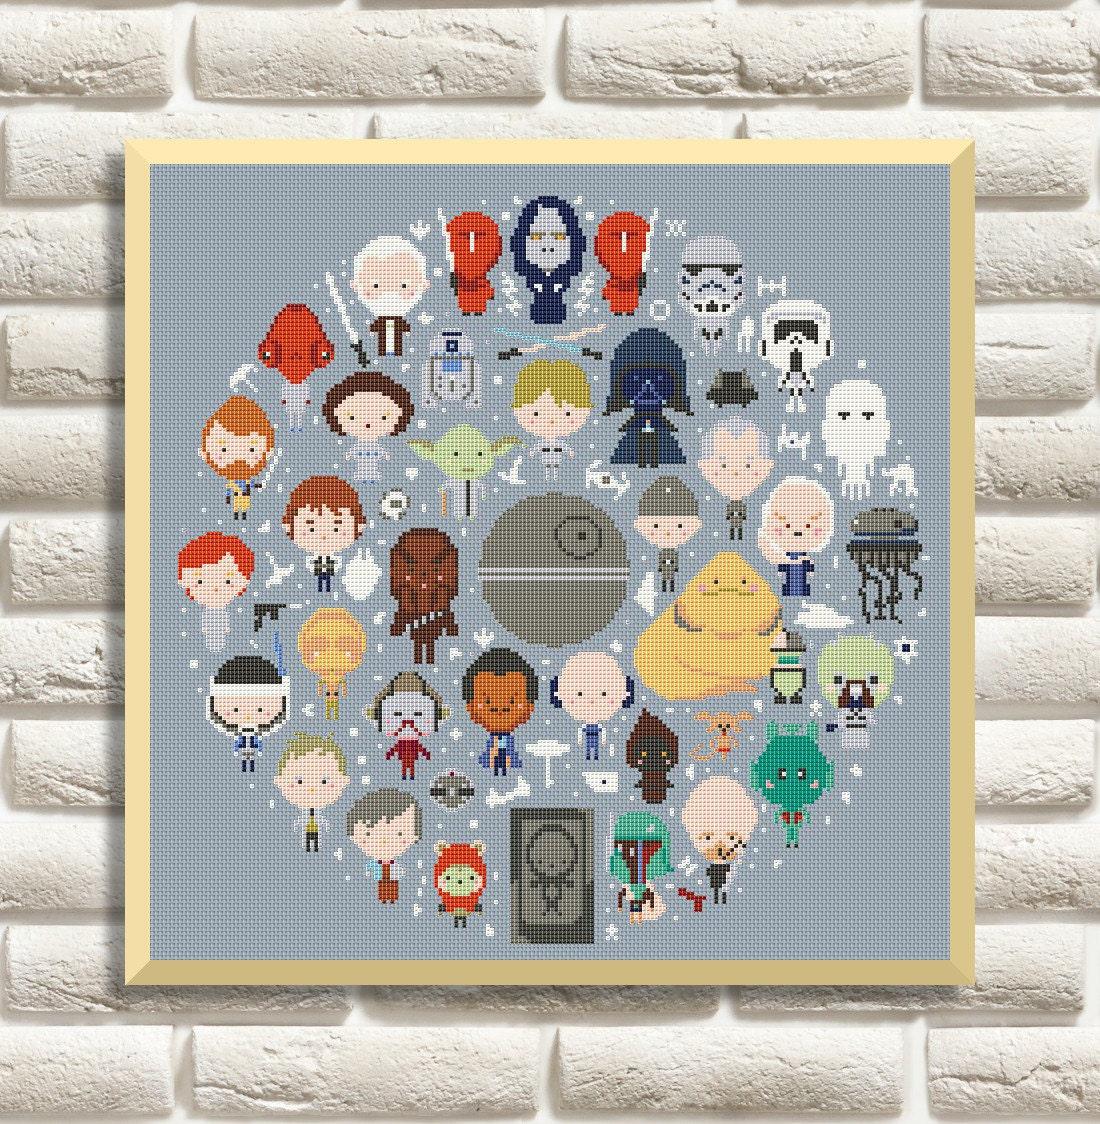 Star Wars Cross Stitch Pattern Mini Pixel People Counted